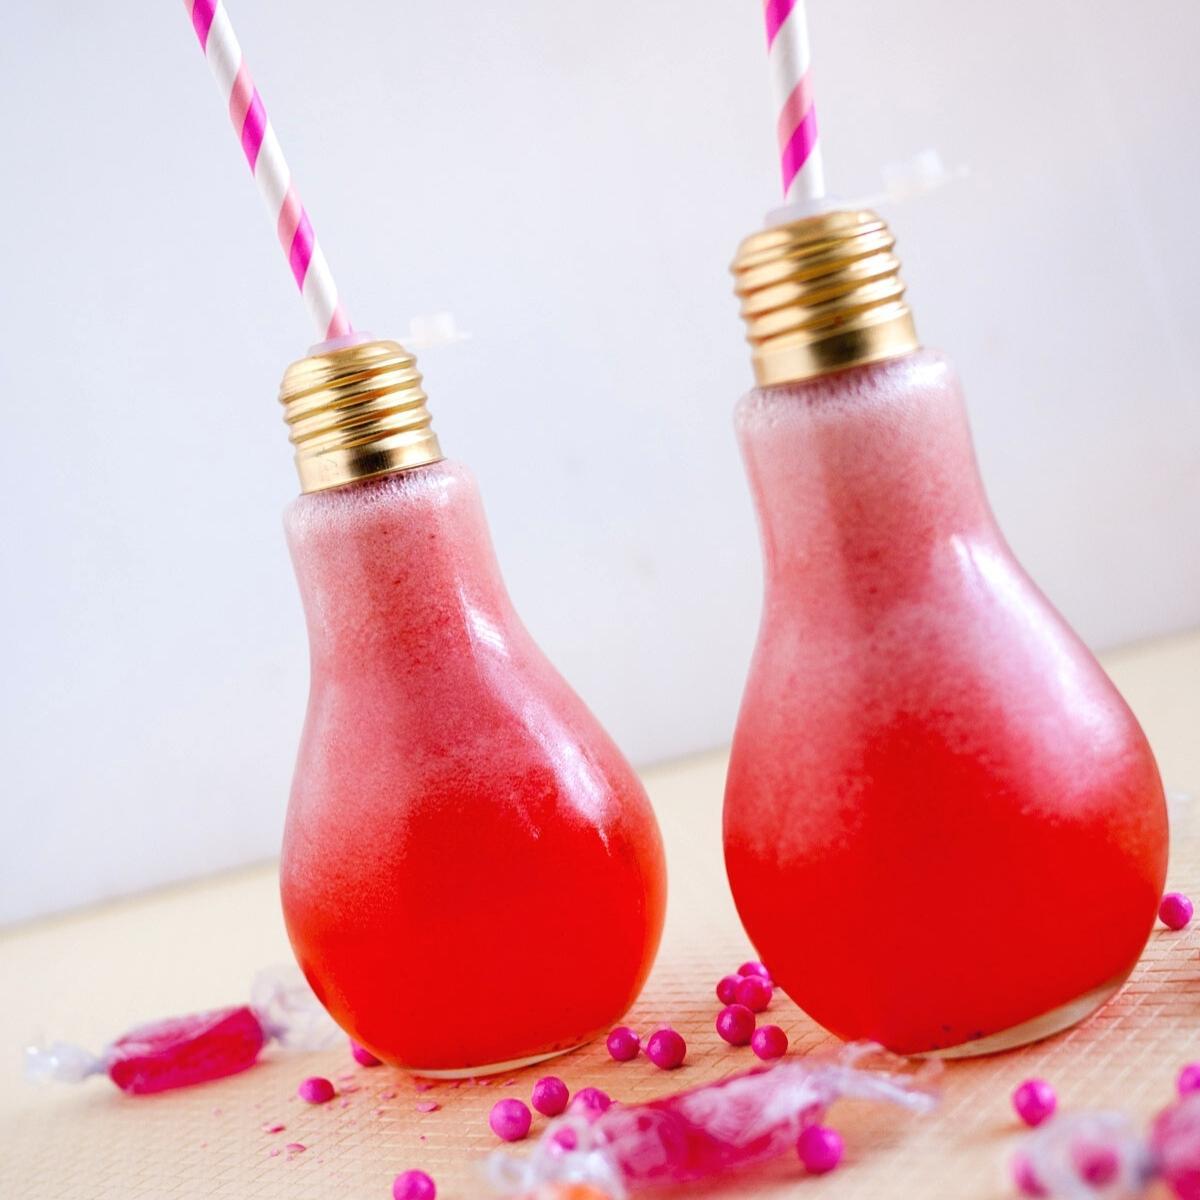 two light bulb shaped glasses with lemonade